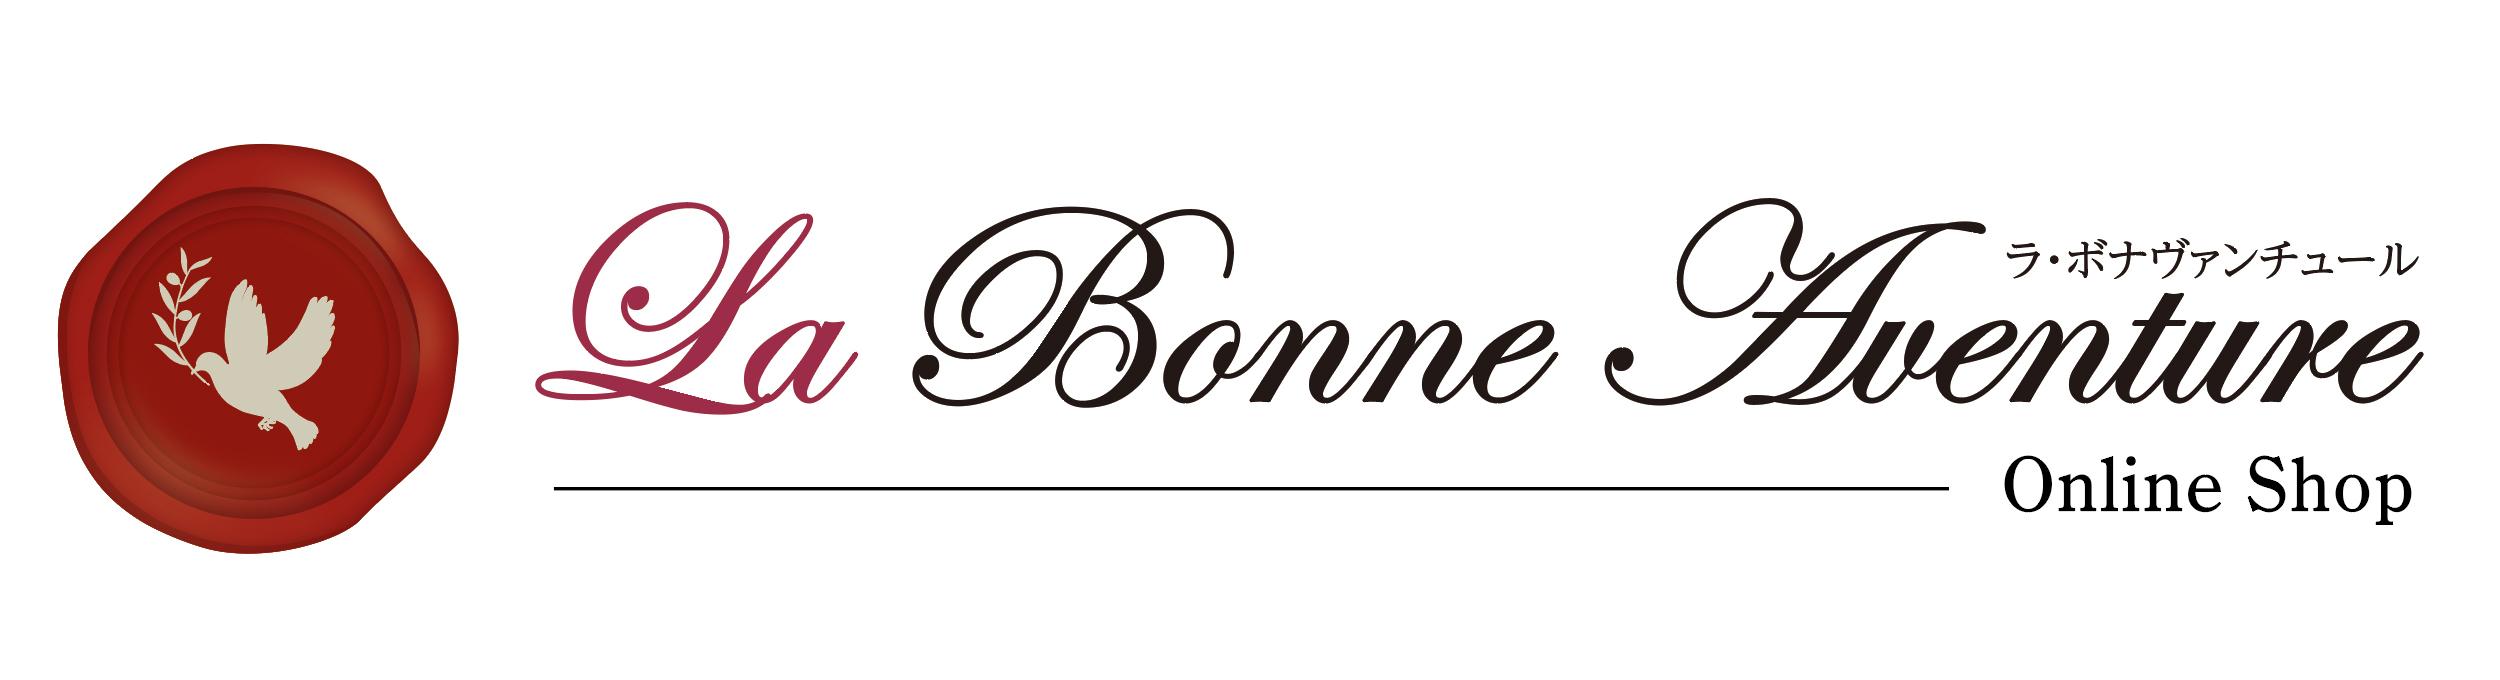 La Bonne Aventure ラボナヴァンチュール